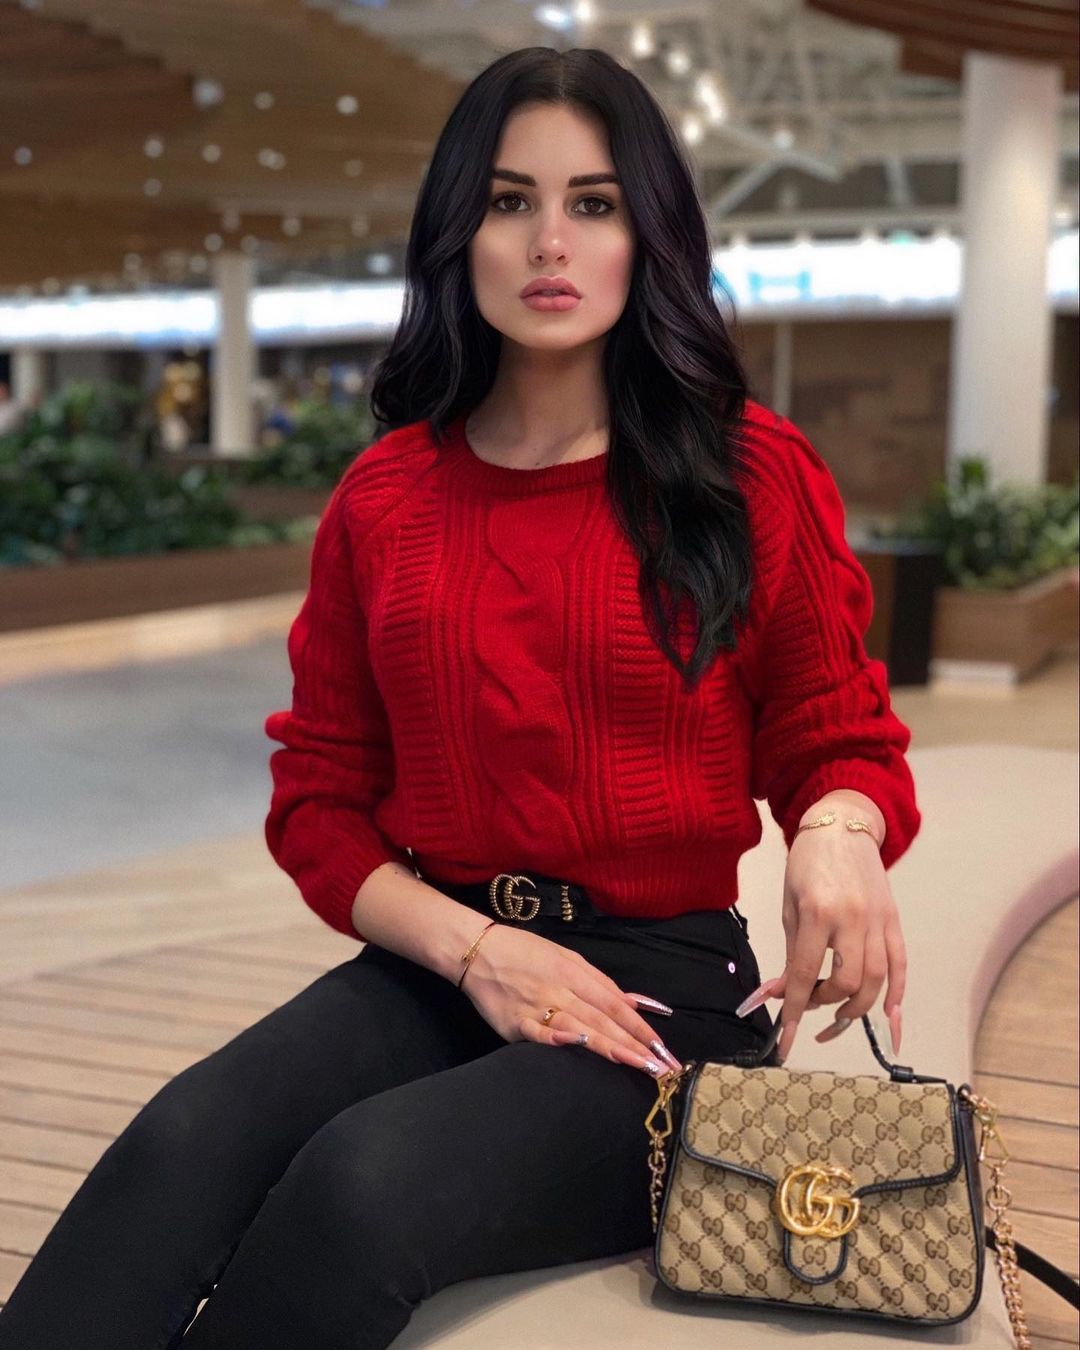 Karina-Arakelyan-Wallpapers-Insta-Fit-Bio-1